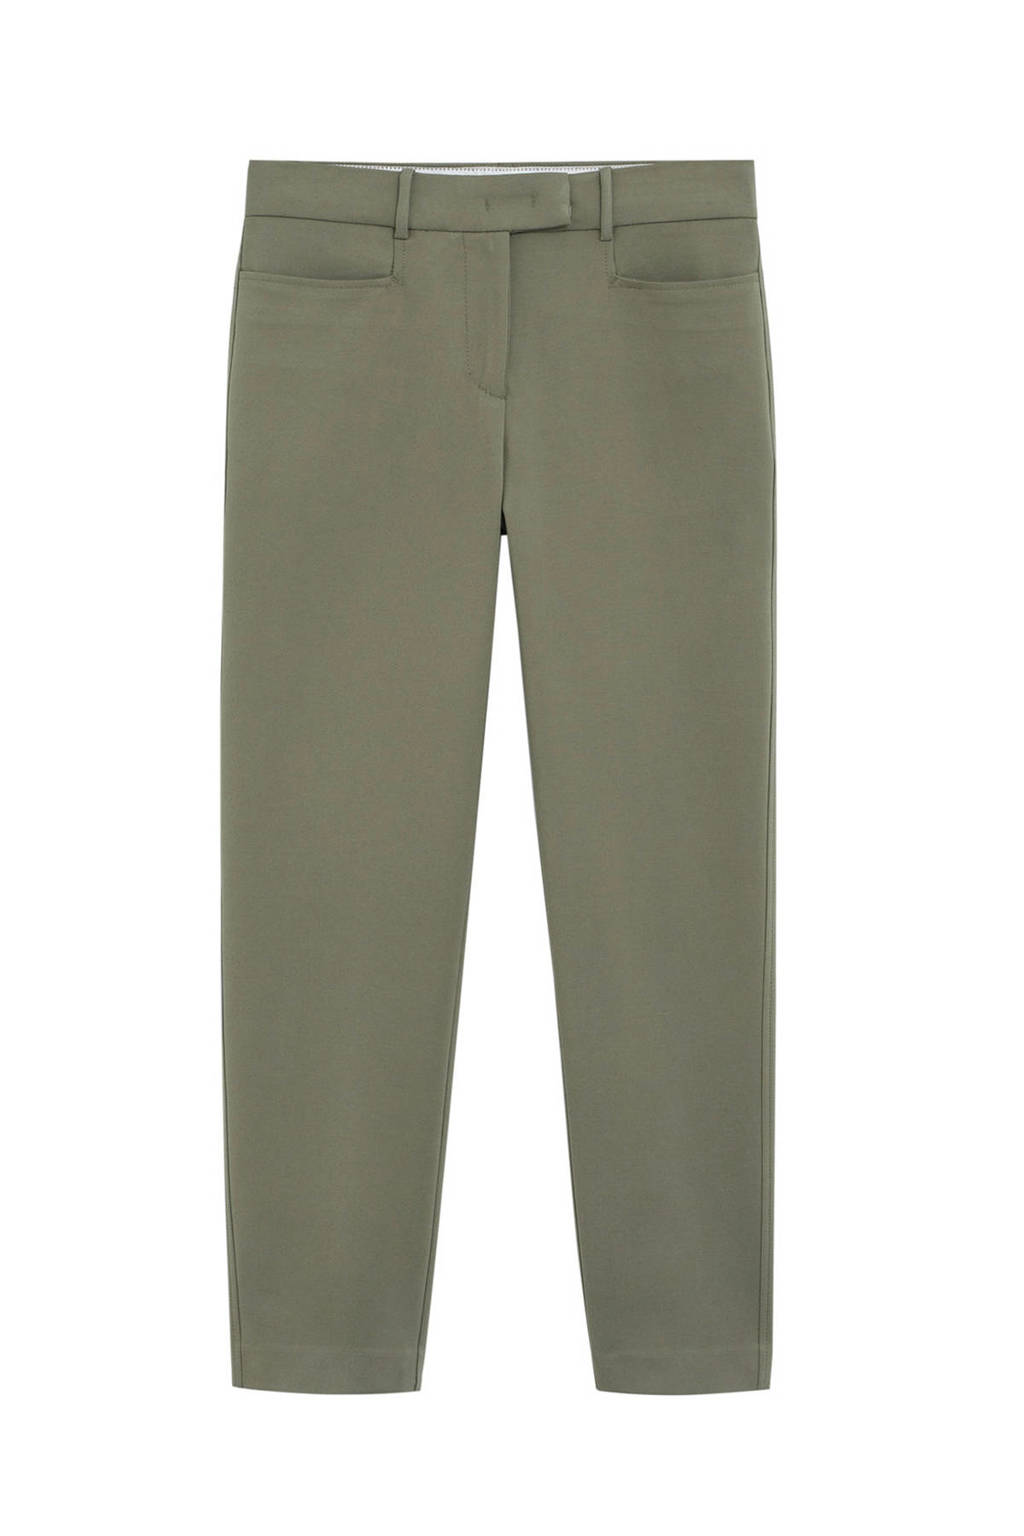 Mango straight fit pantalon groen, Groen